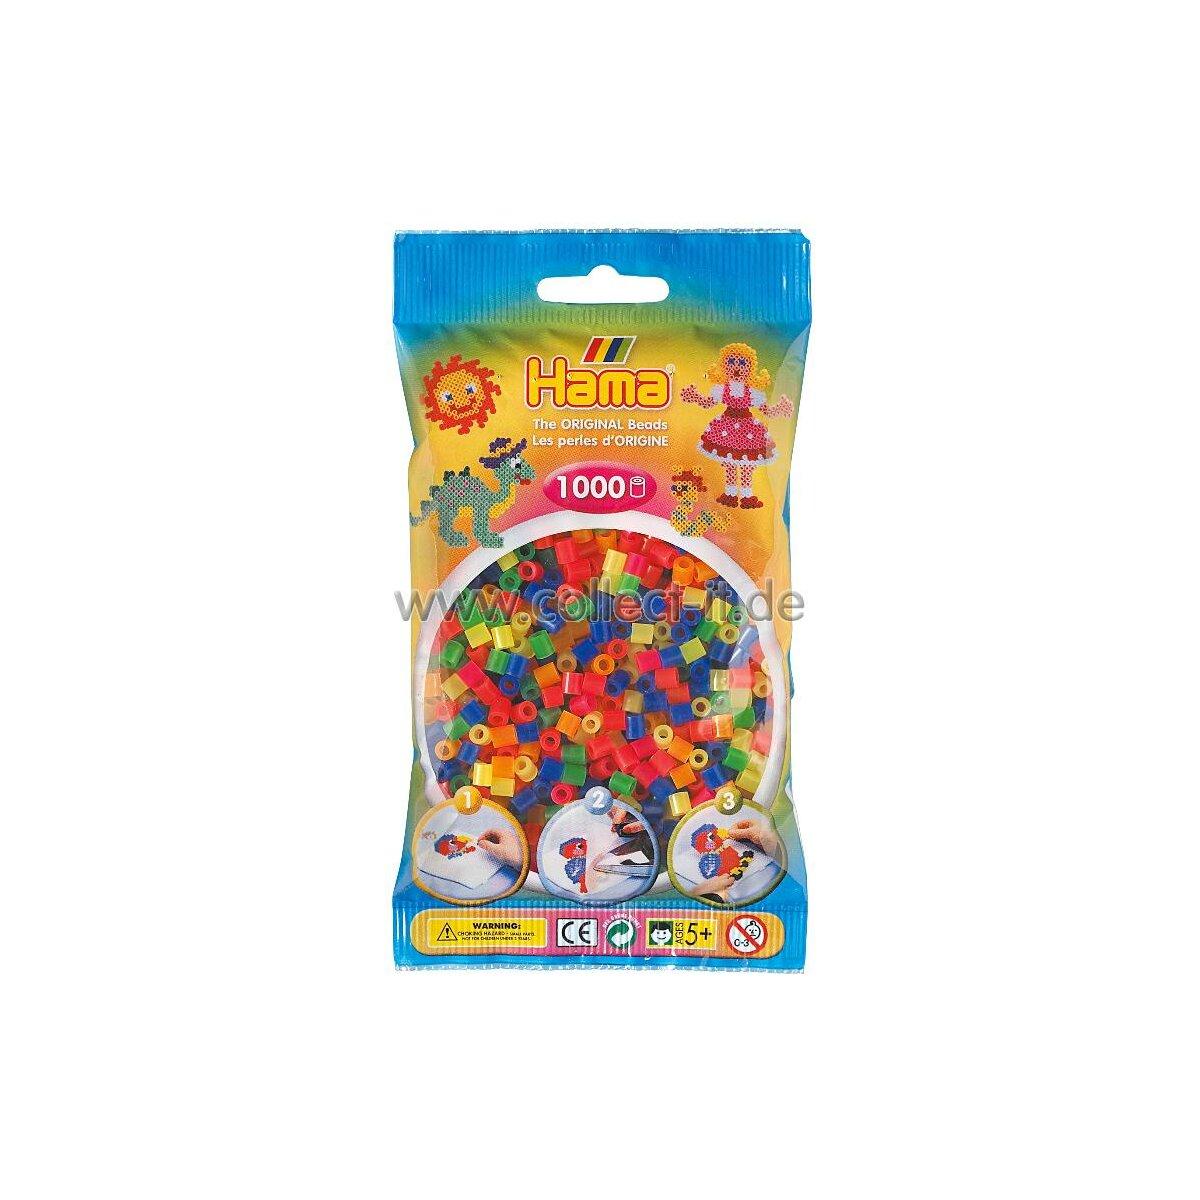 Hama Perlen Pastell Gemischt 1000 Stuck Ebay